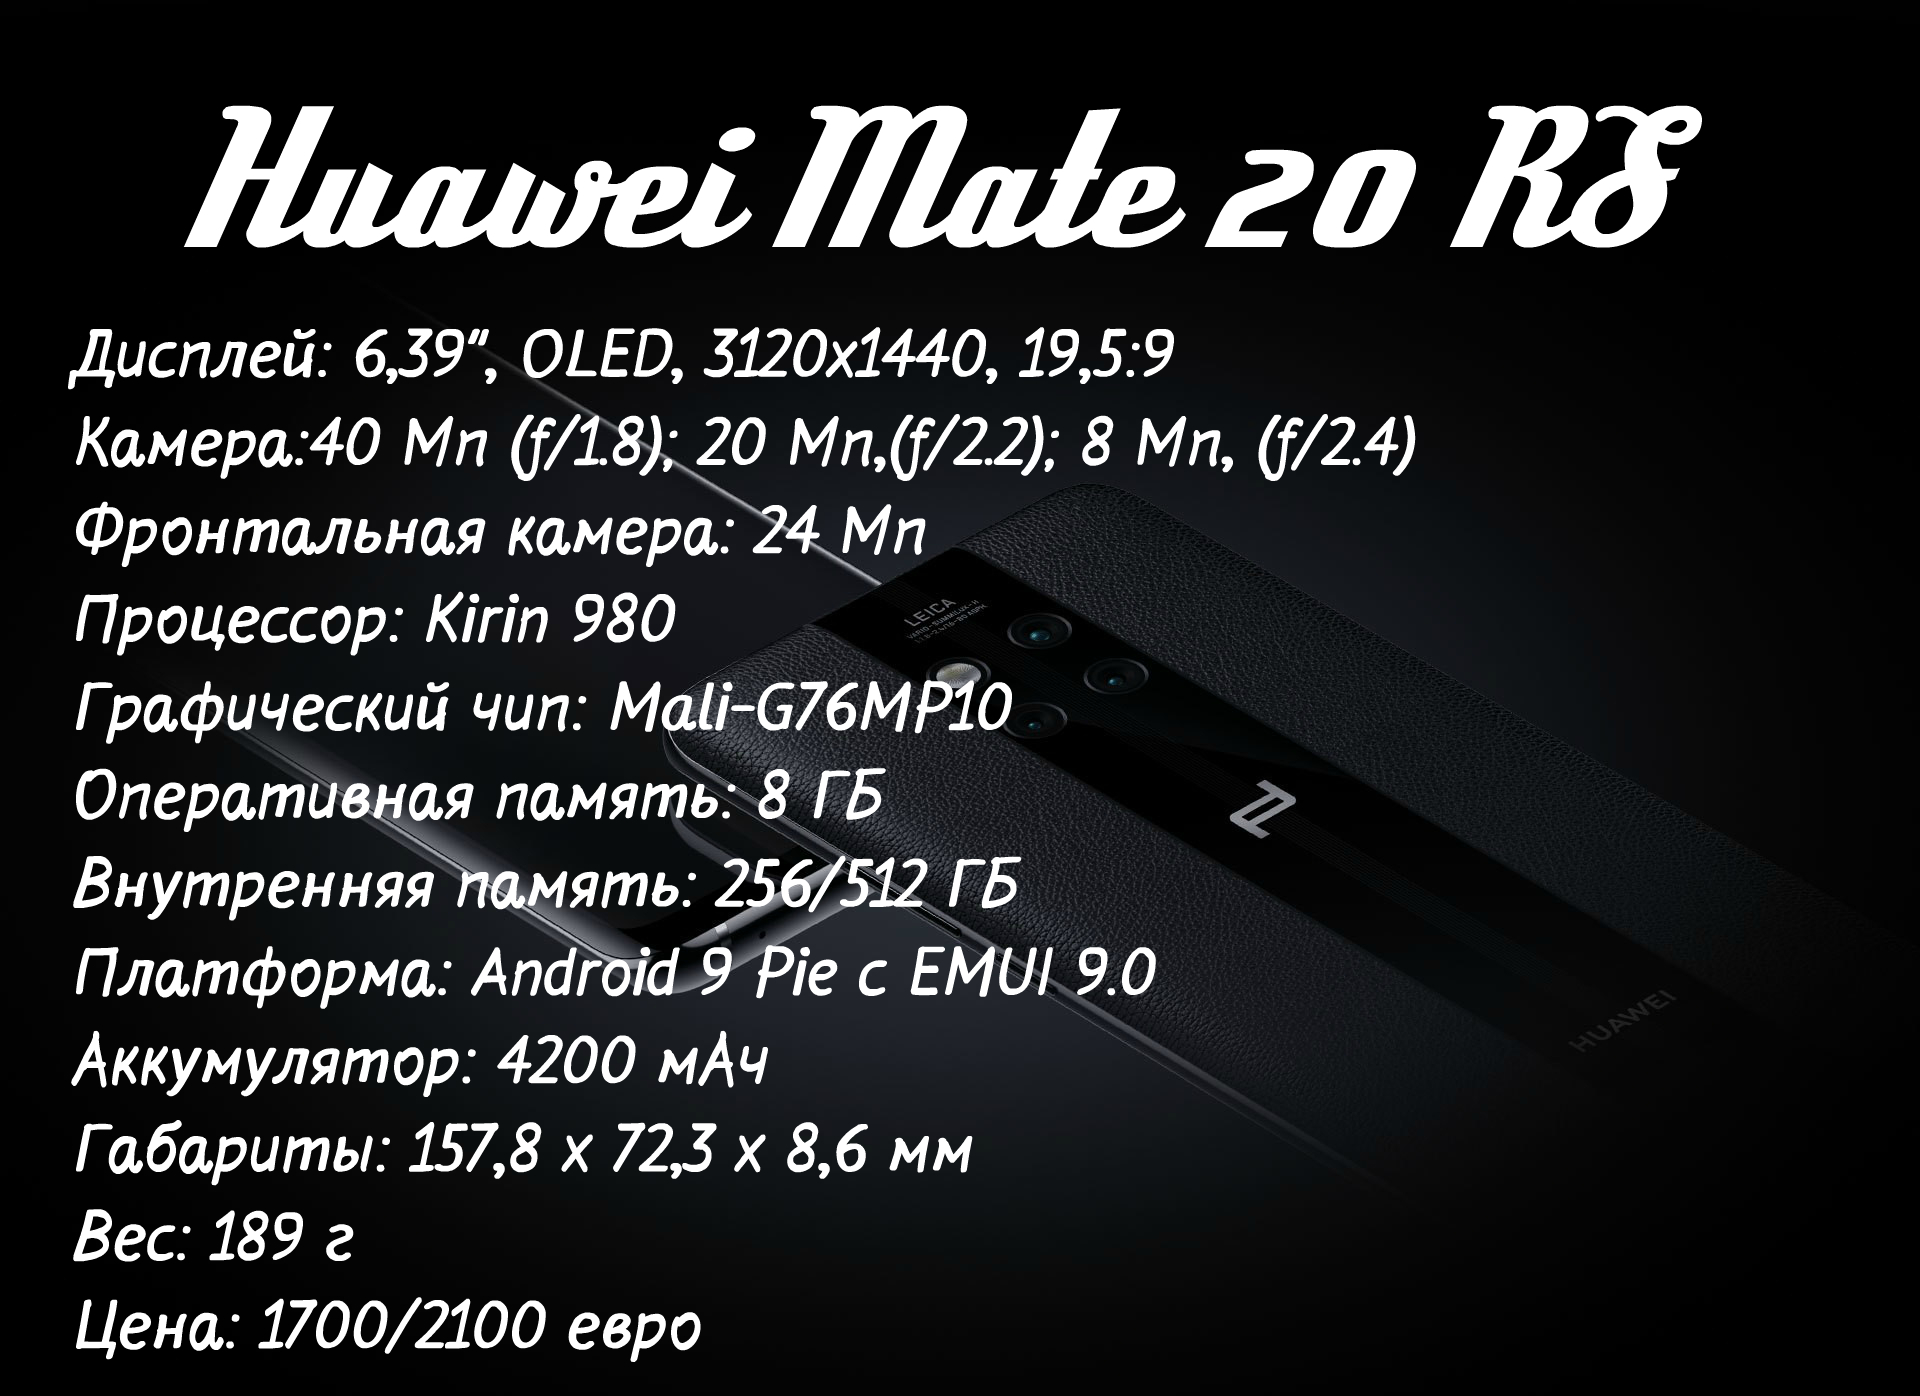 характеристики Huawei Mate 20 Porsche Design